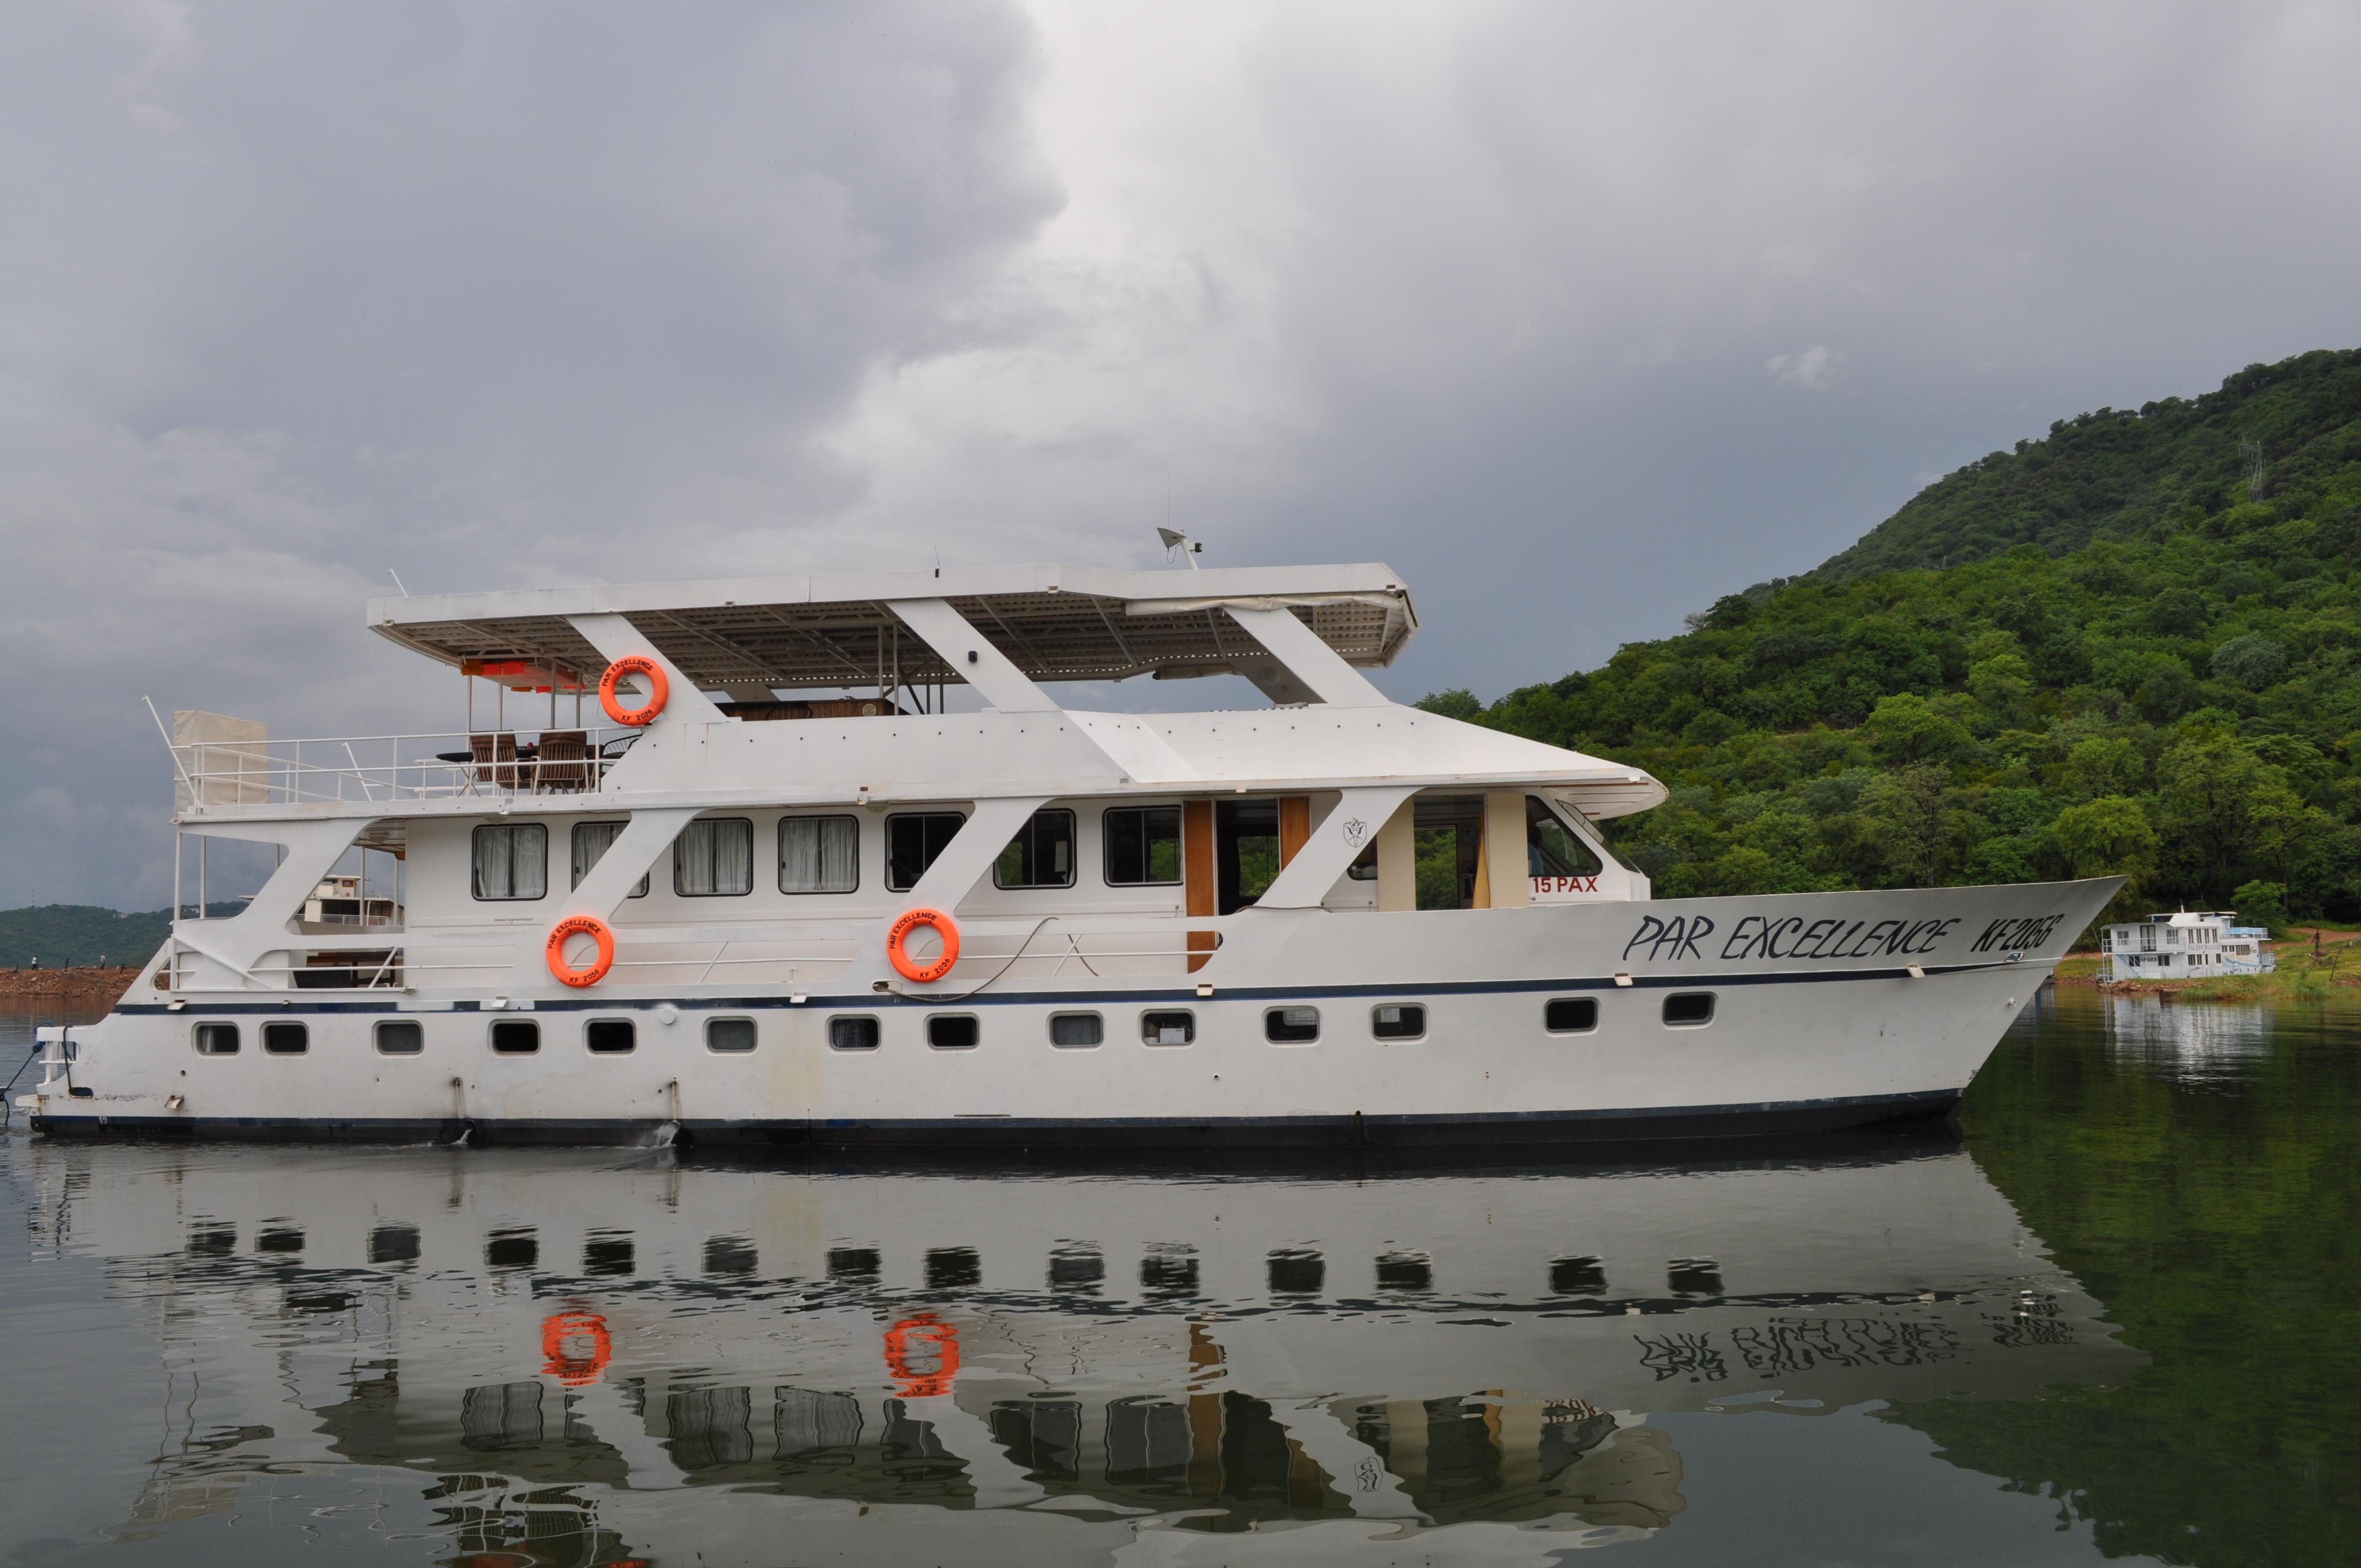 Houseboats 4 Africa Par Excellence